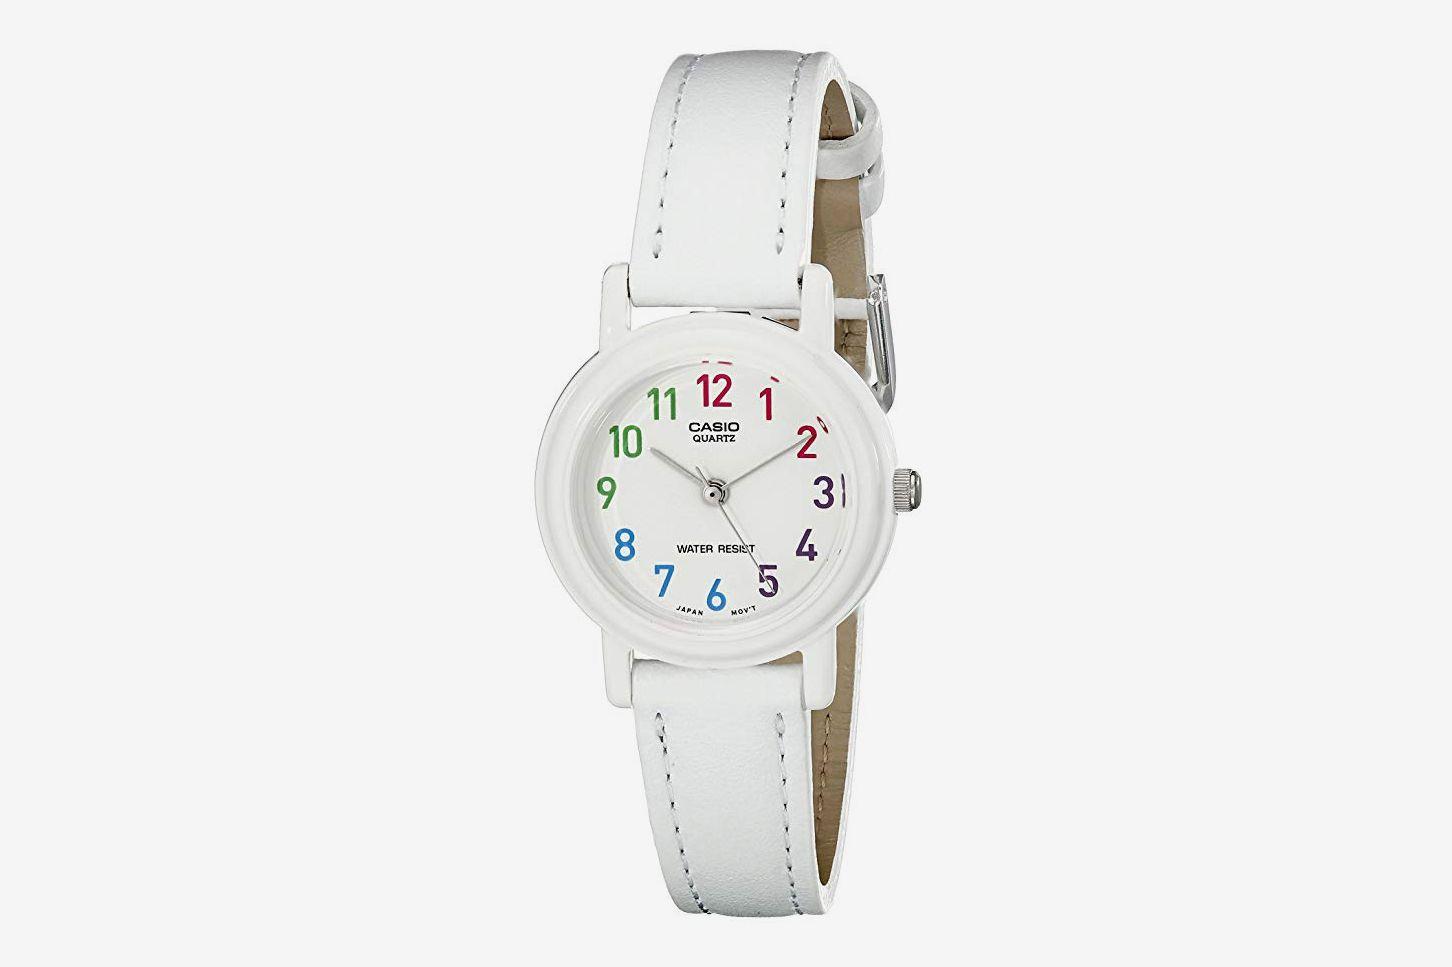 Casio Women's Analog Japanese Quartz Watch